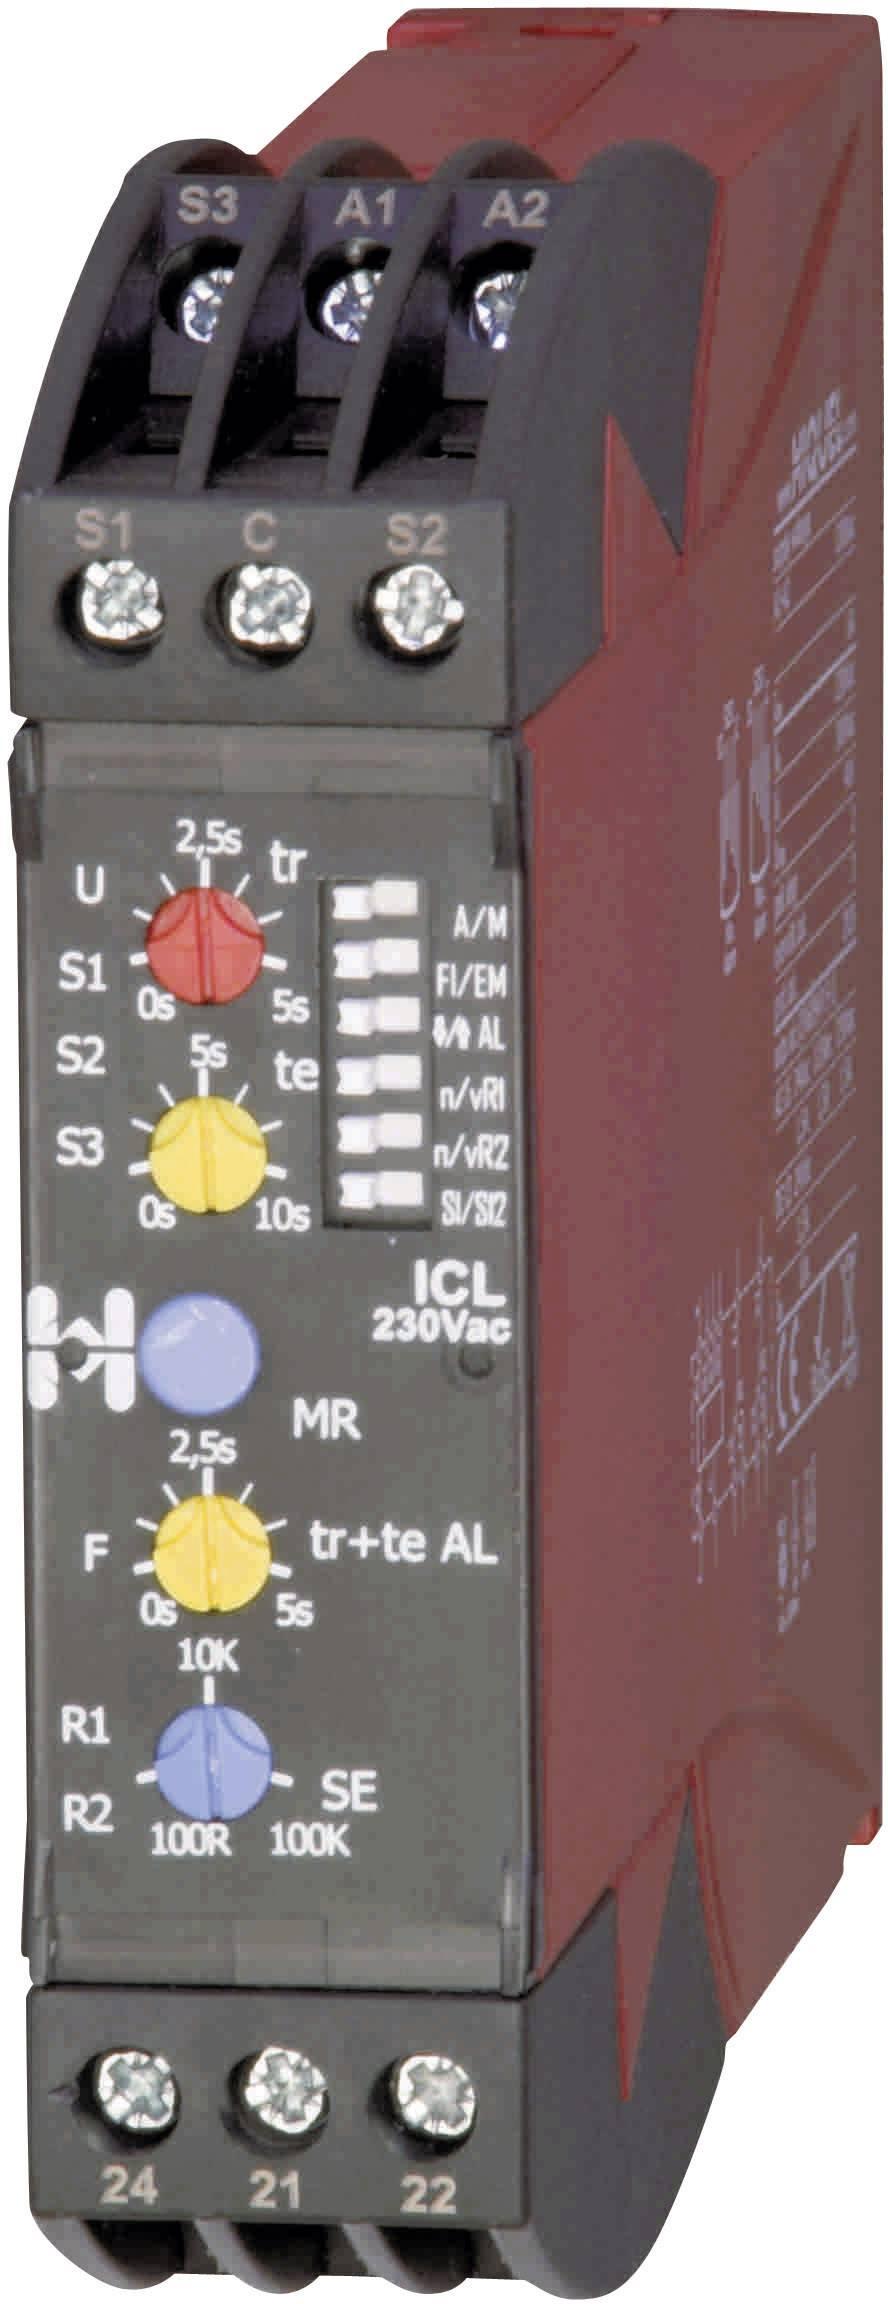 Kontrolné relé Hiquel ICL 230Vac ICL 230Vac